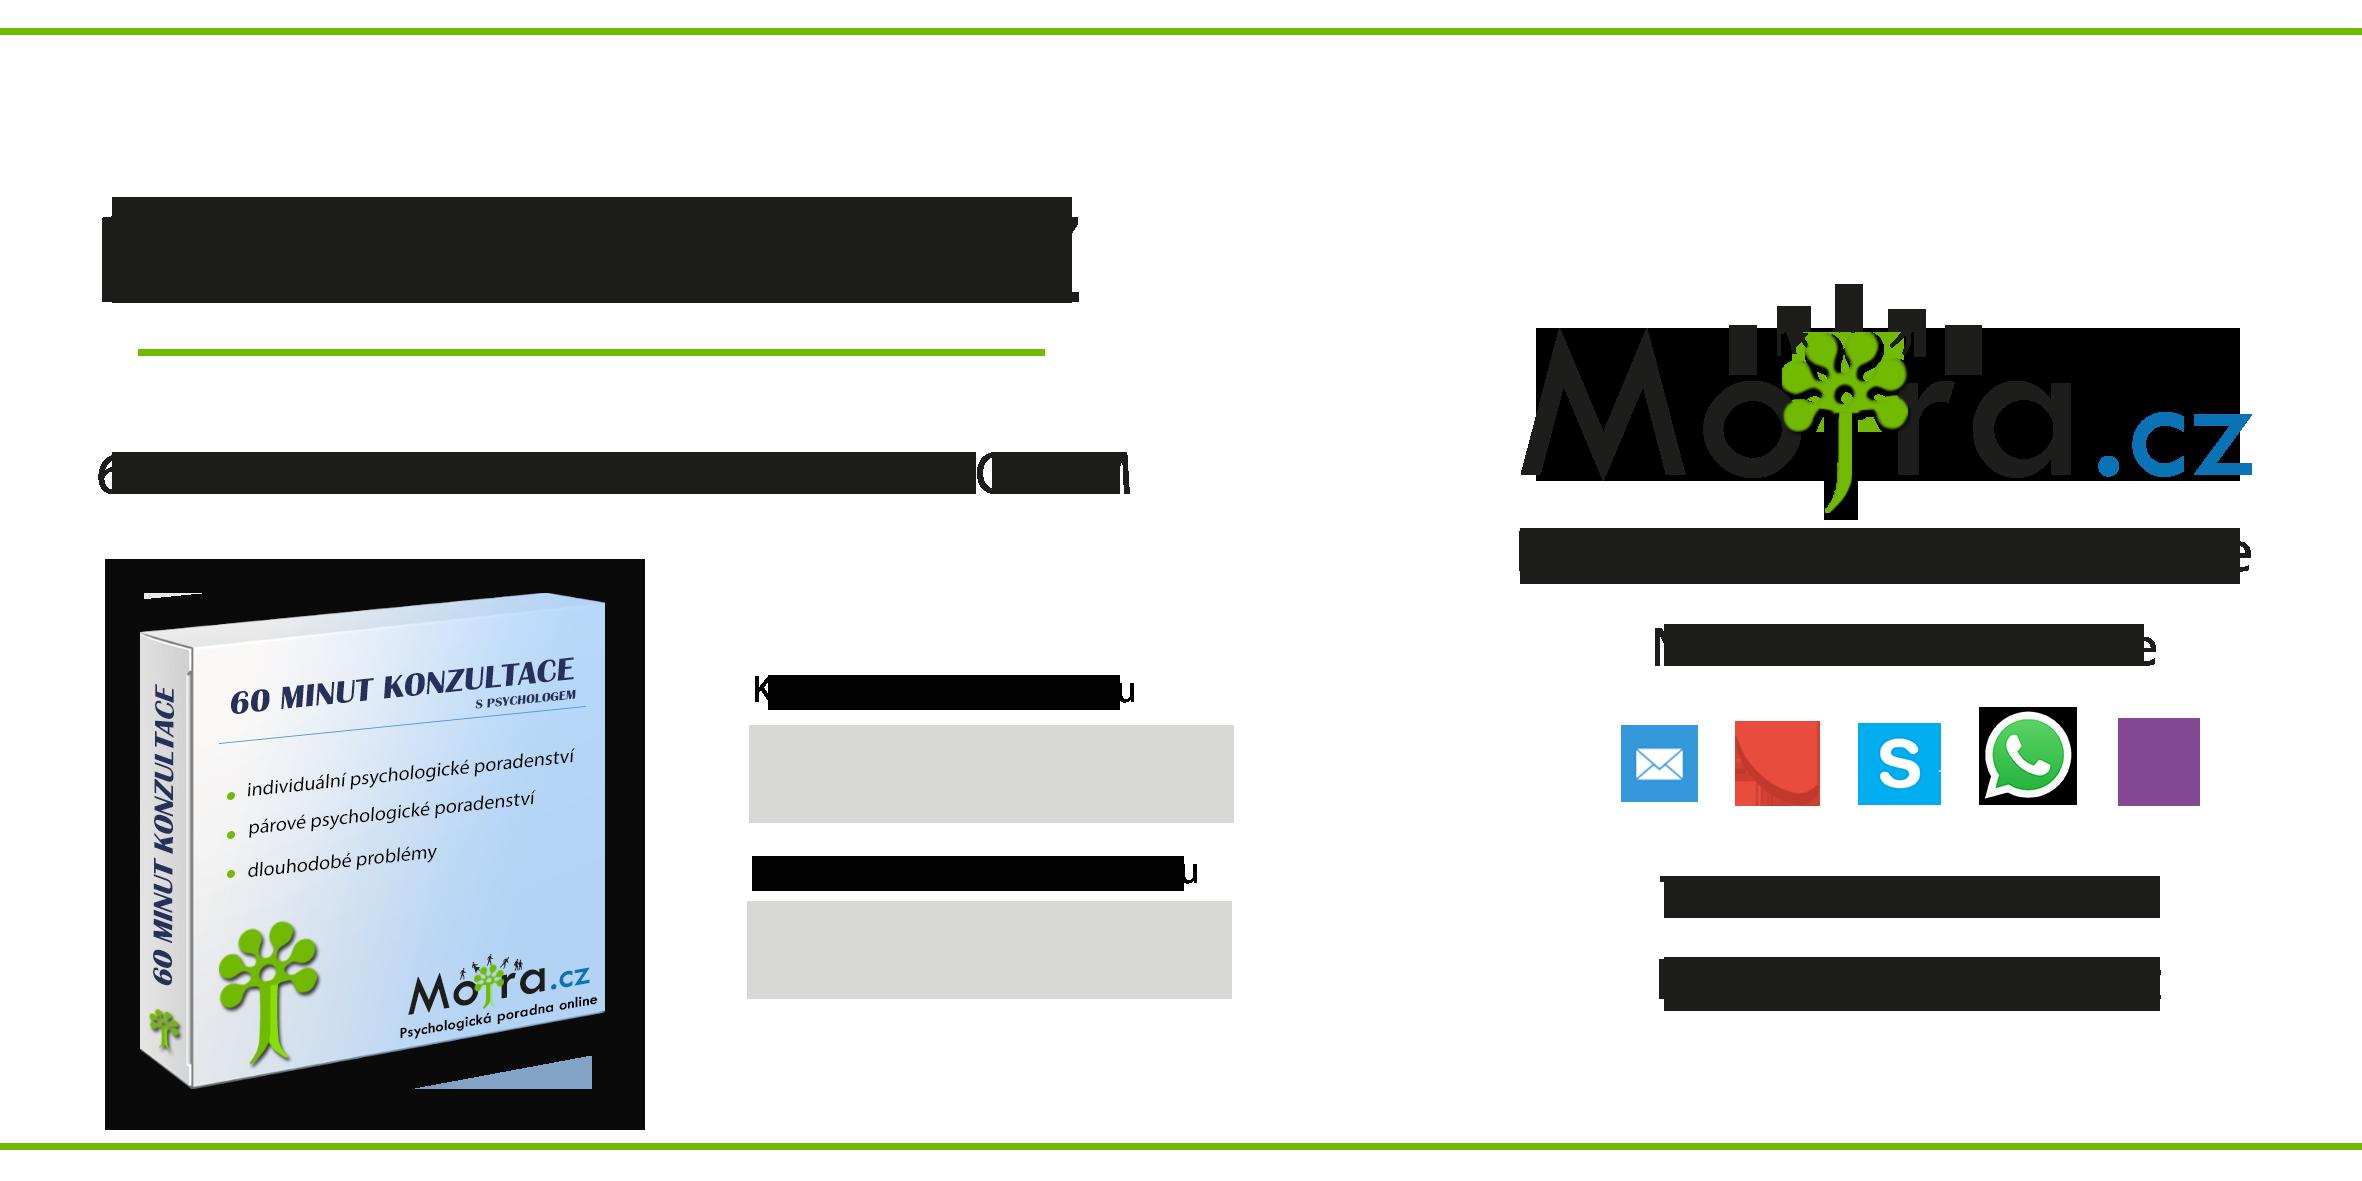 60 minut konzultace s psychologem